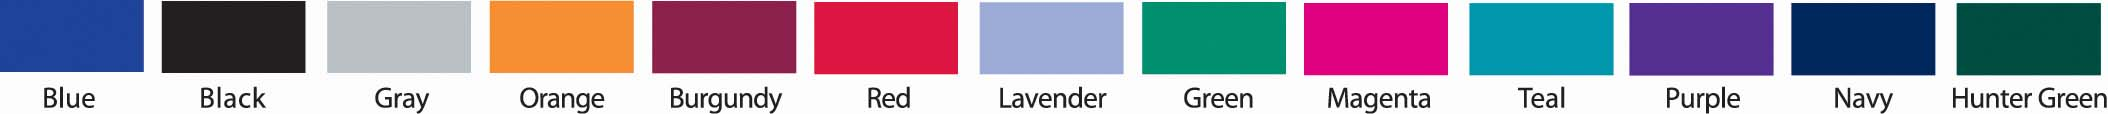 spectrum-nurse-stethoscope-adult-boxed-lavender-10-428-110-lr-3.jpg